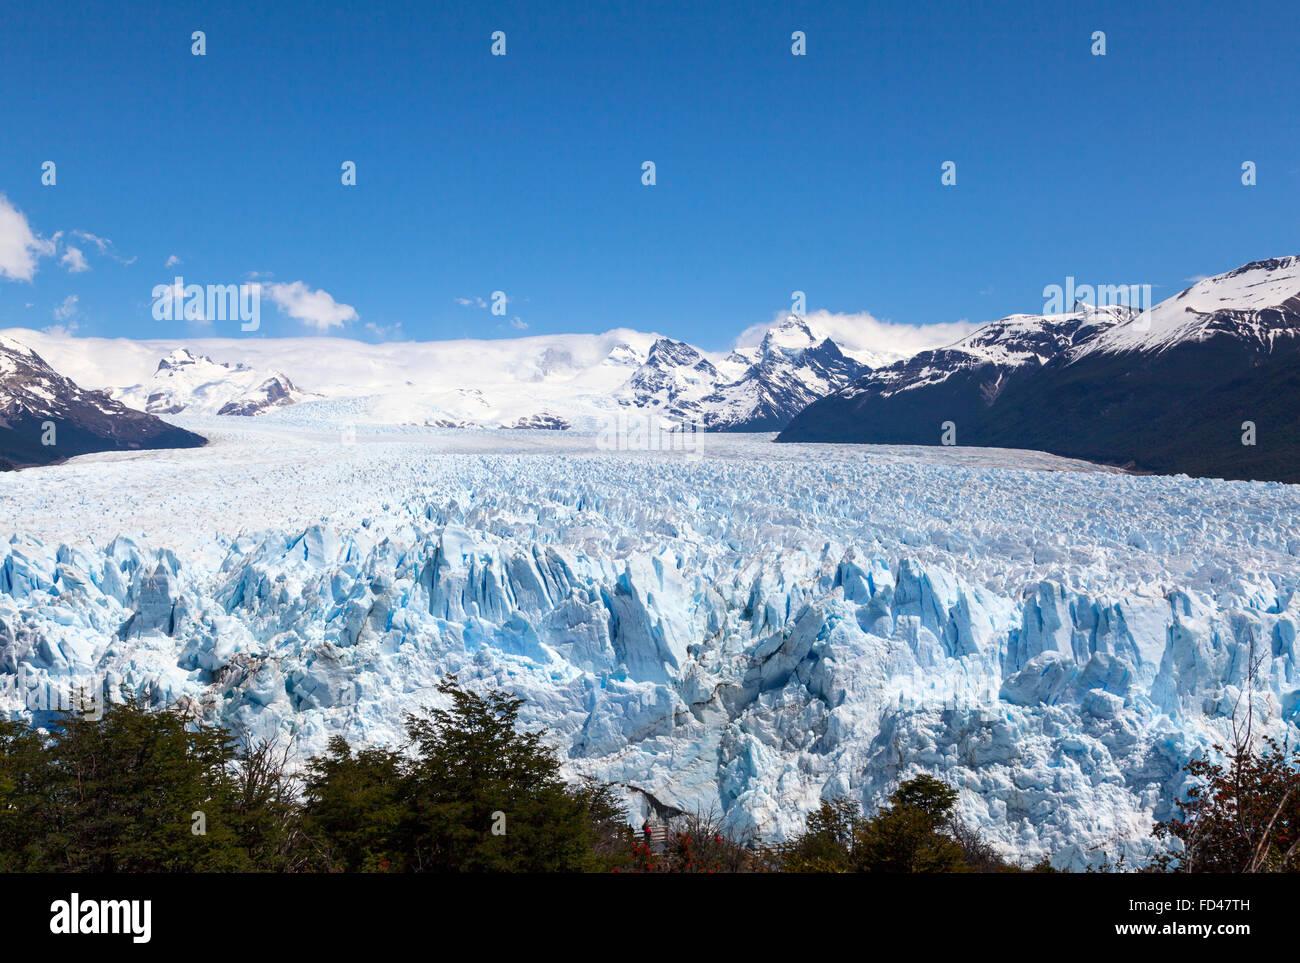 Der Nationalpark Los Glaciares, Argentinien Stockbild